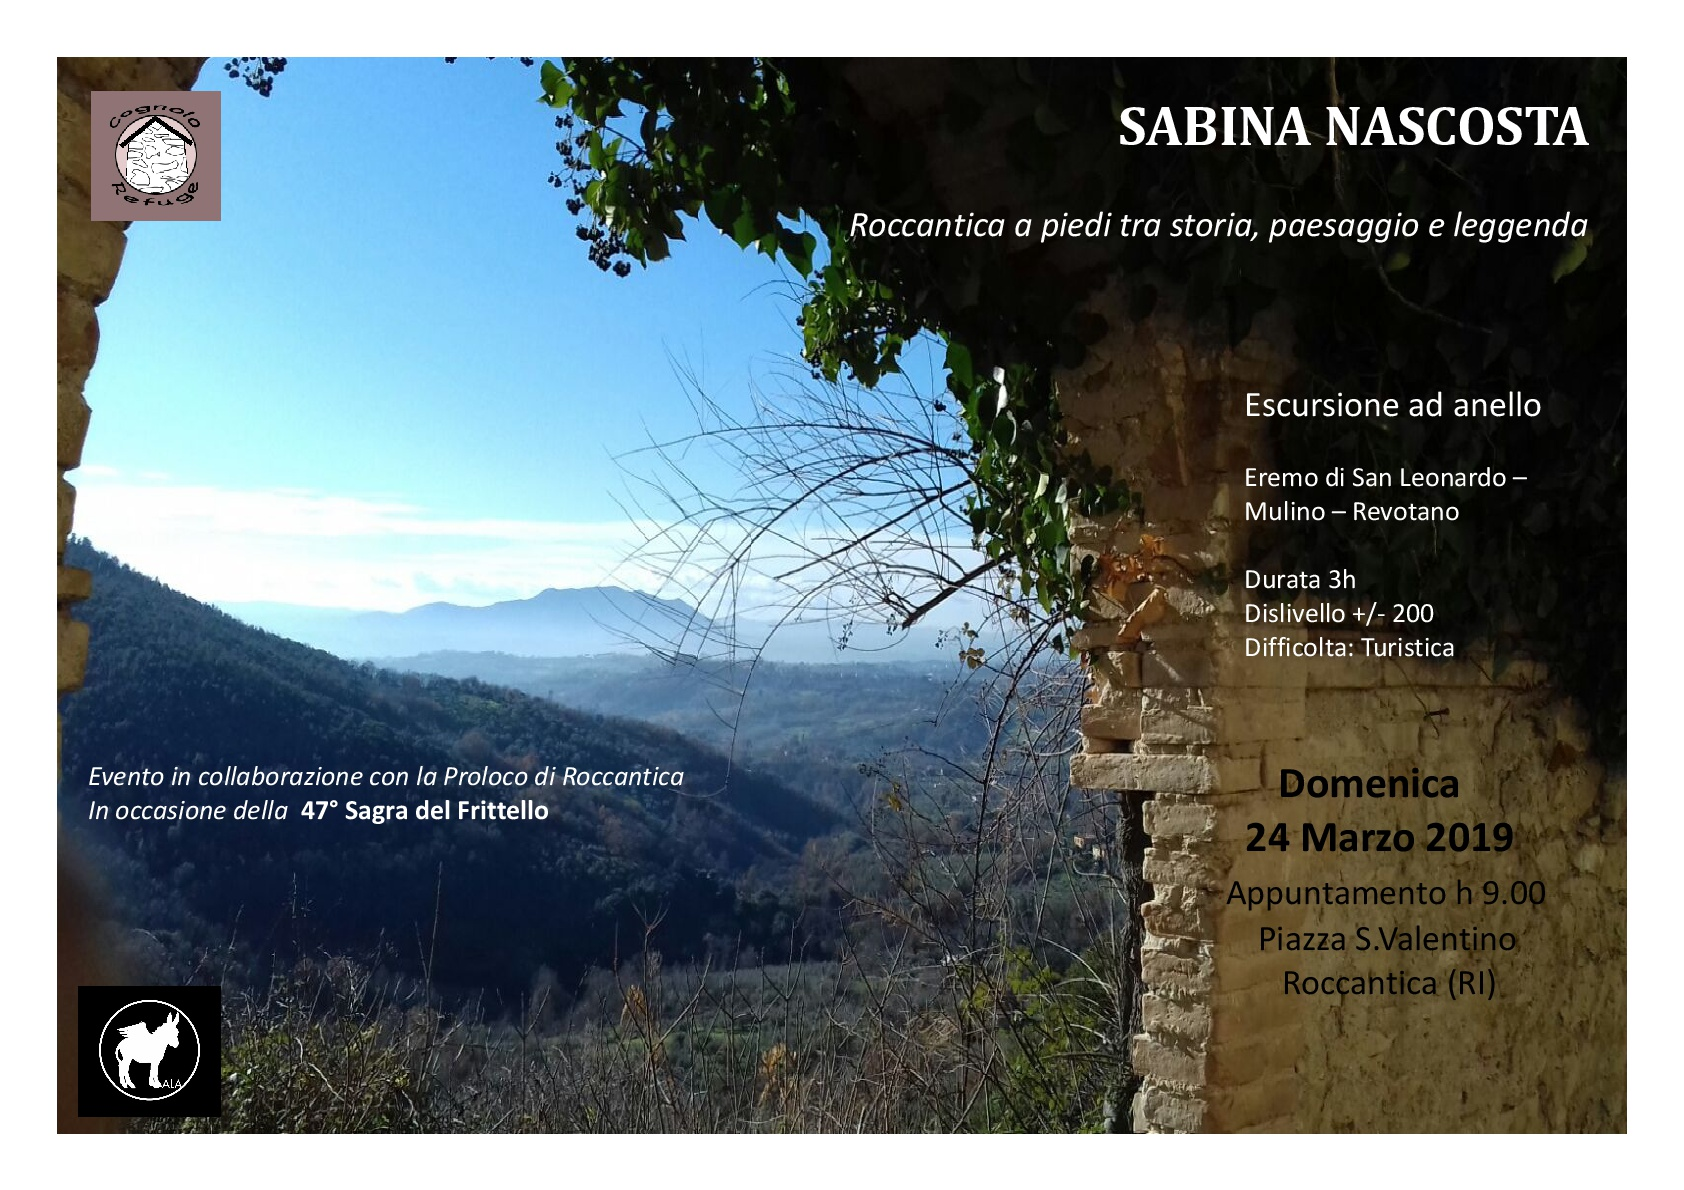 Sabina Nascosta: a piedi tra storia, paesaggio e leggenda - eventi in sabina